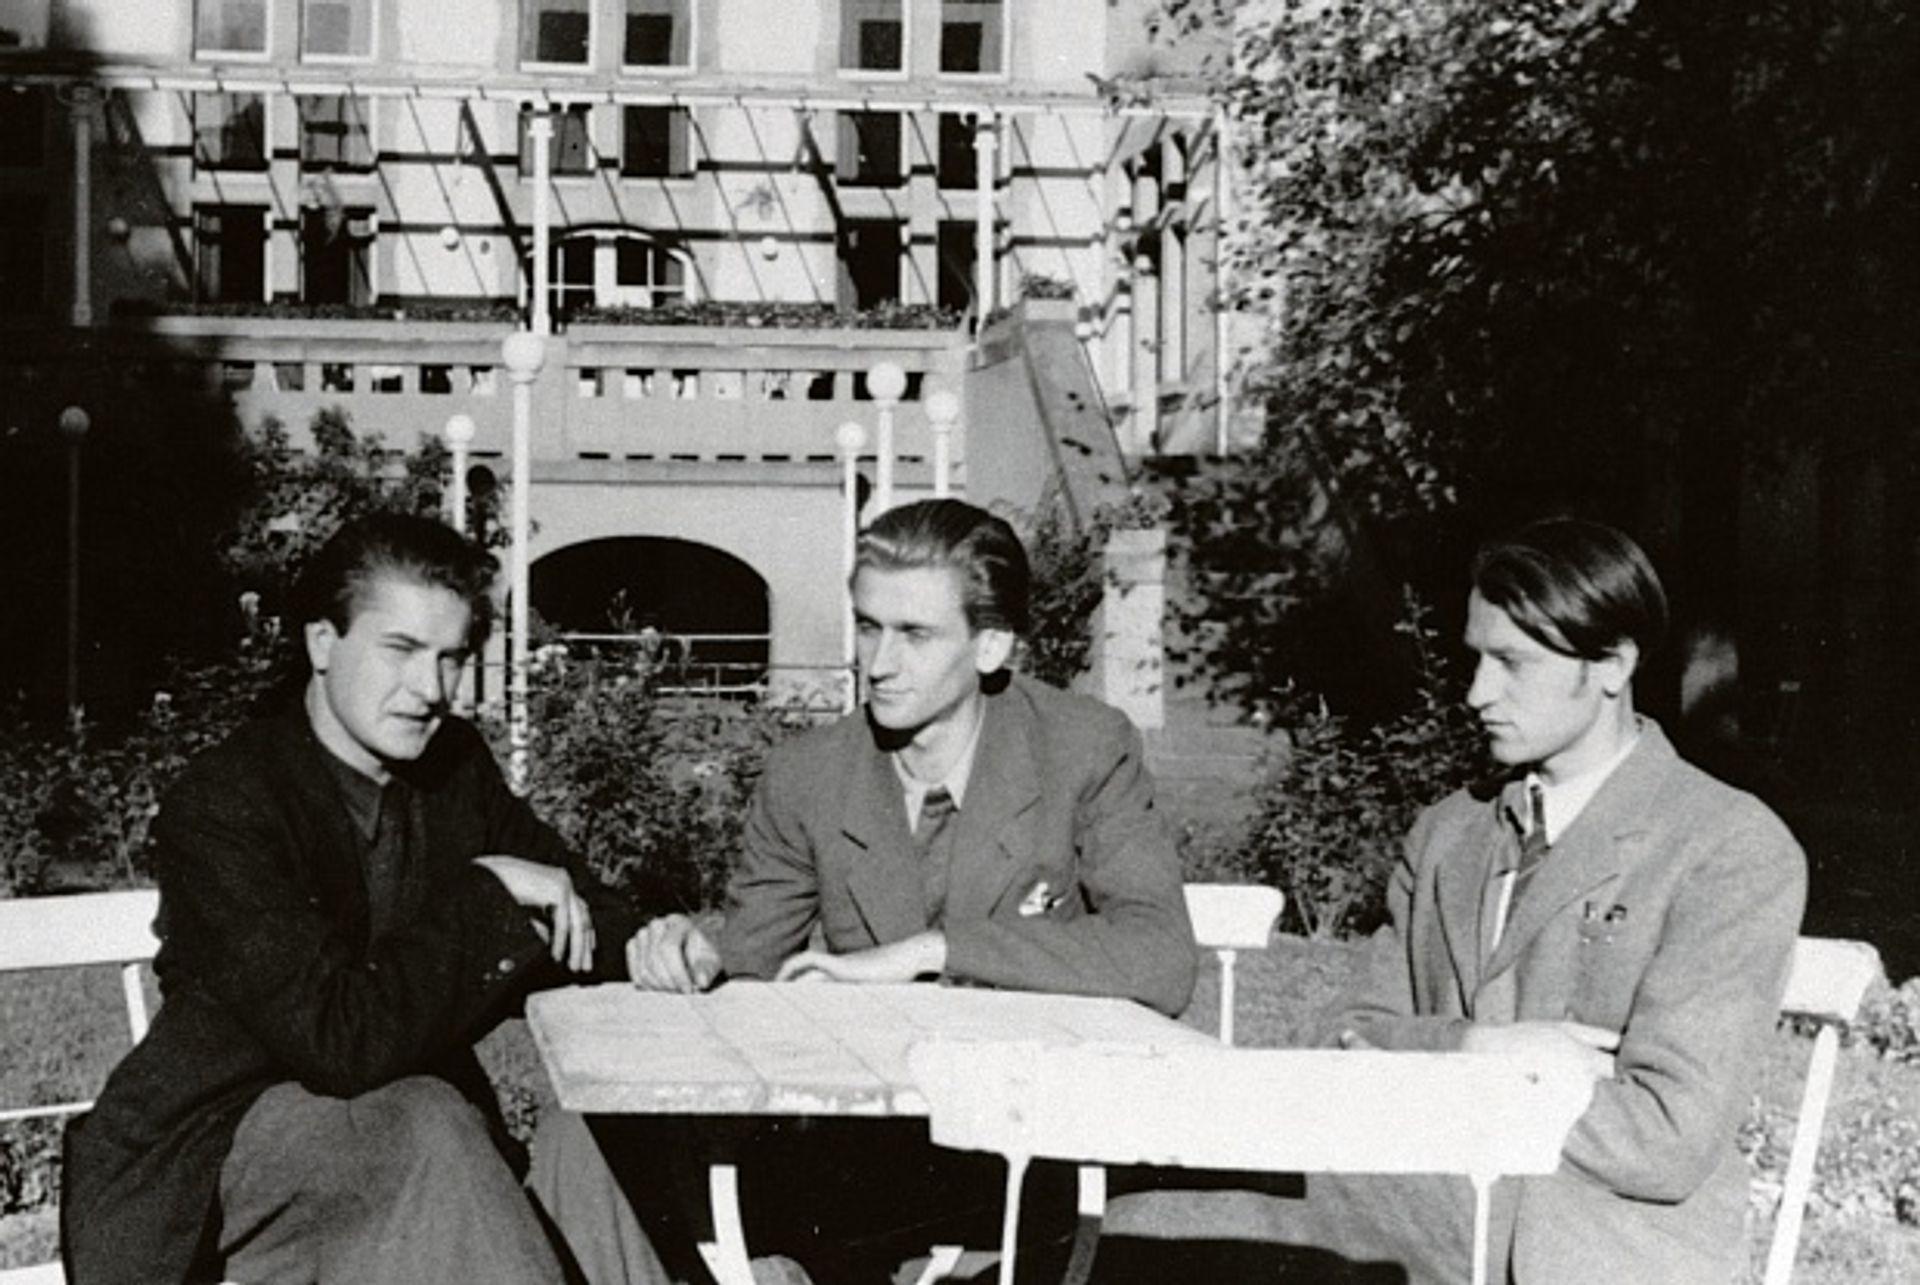 The artist Jonas Mekas (far right) in Wiesbaden, in 1945, with his brother, Adolfas, and friend Algirdas Landsbergis. Jonas Mekas